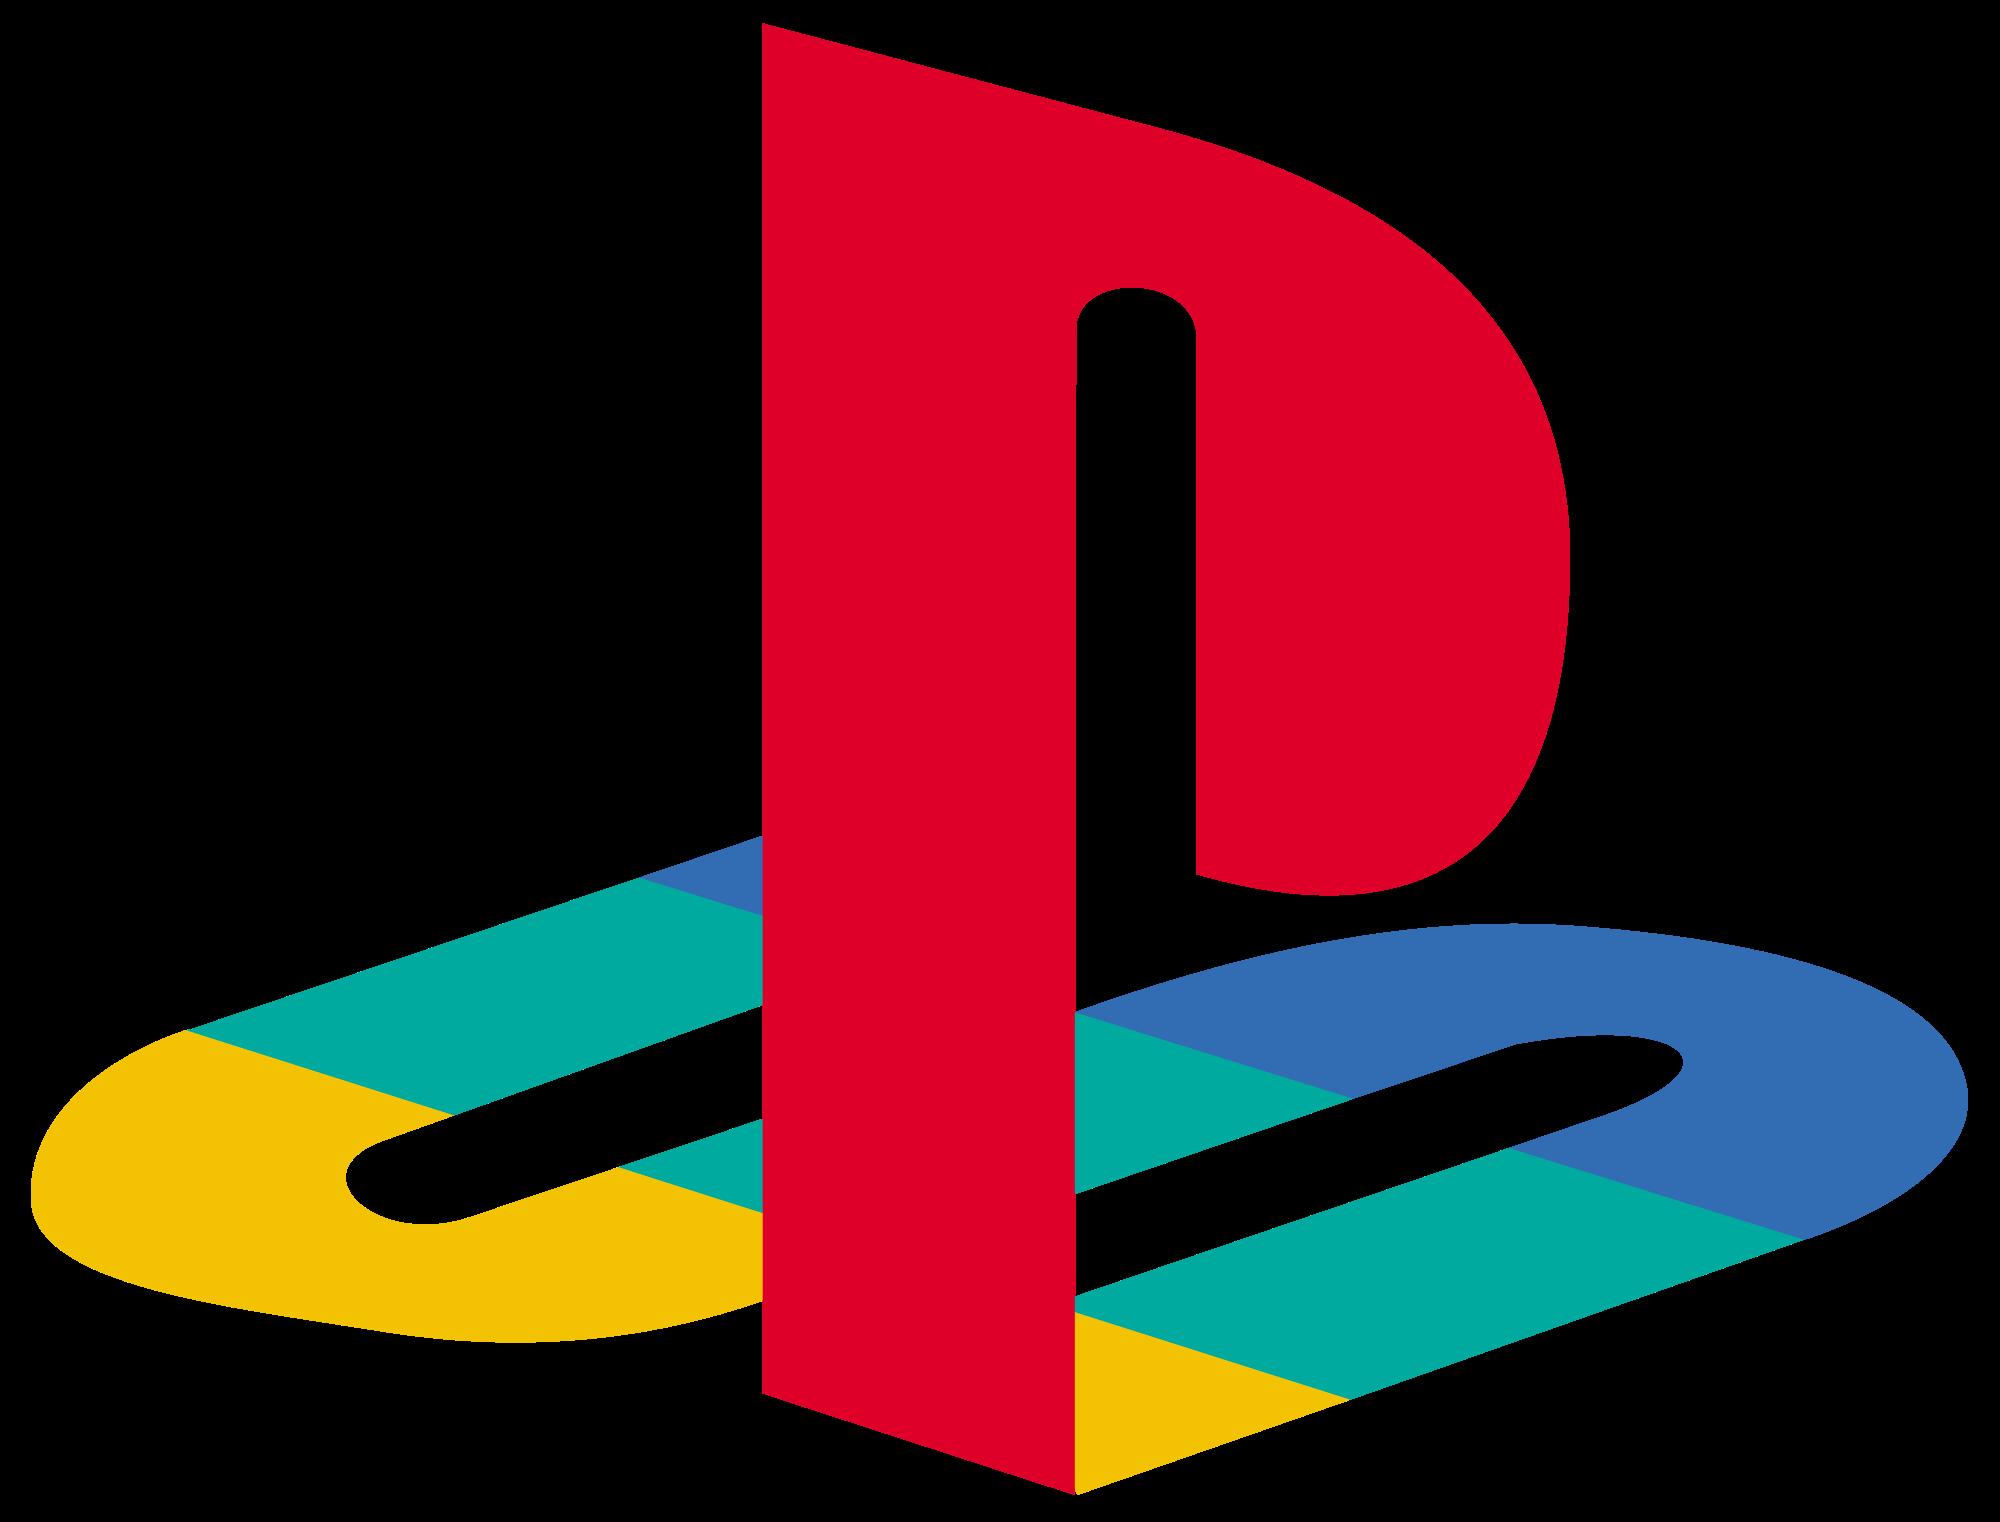 image playstation 1 logo png gta wiki fandom powered by wikia rh gta wikia com playstation 1 color playstation 1 logo font